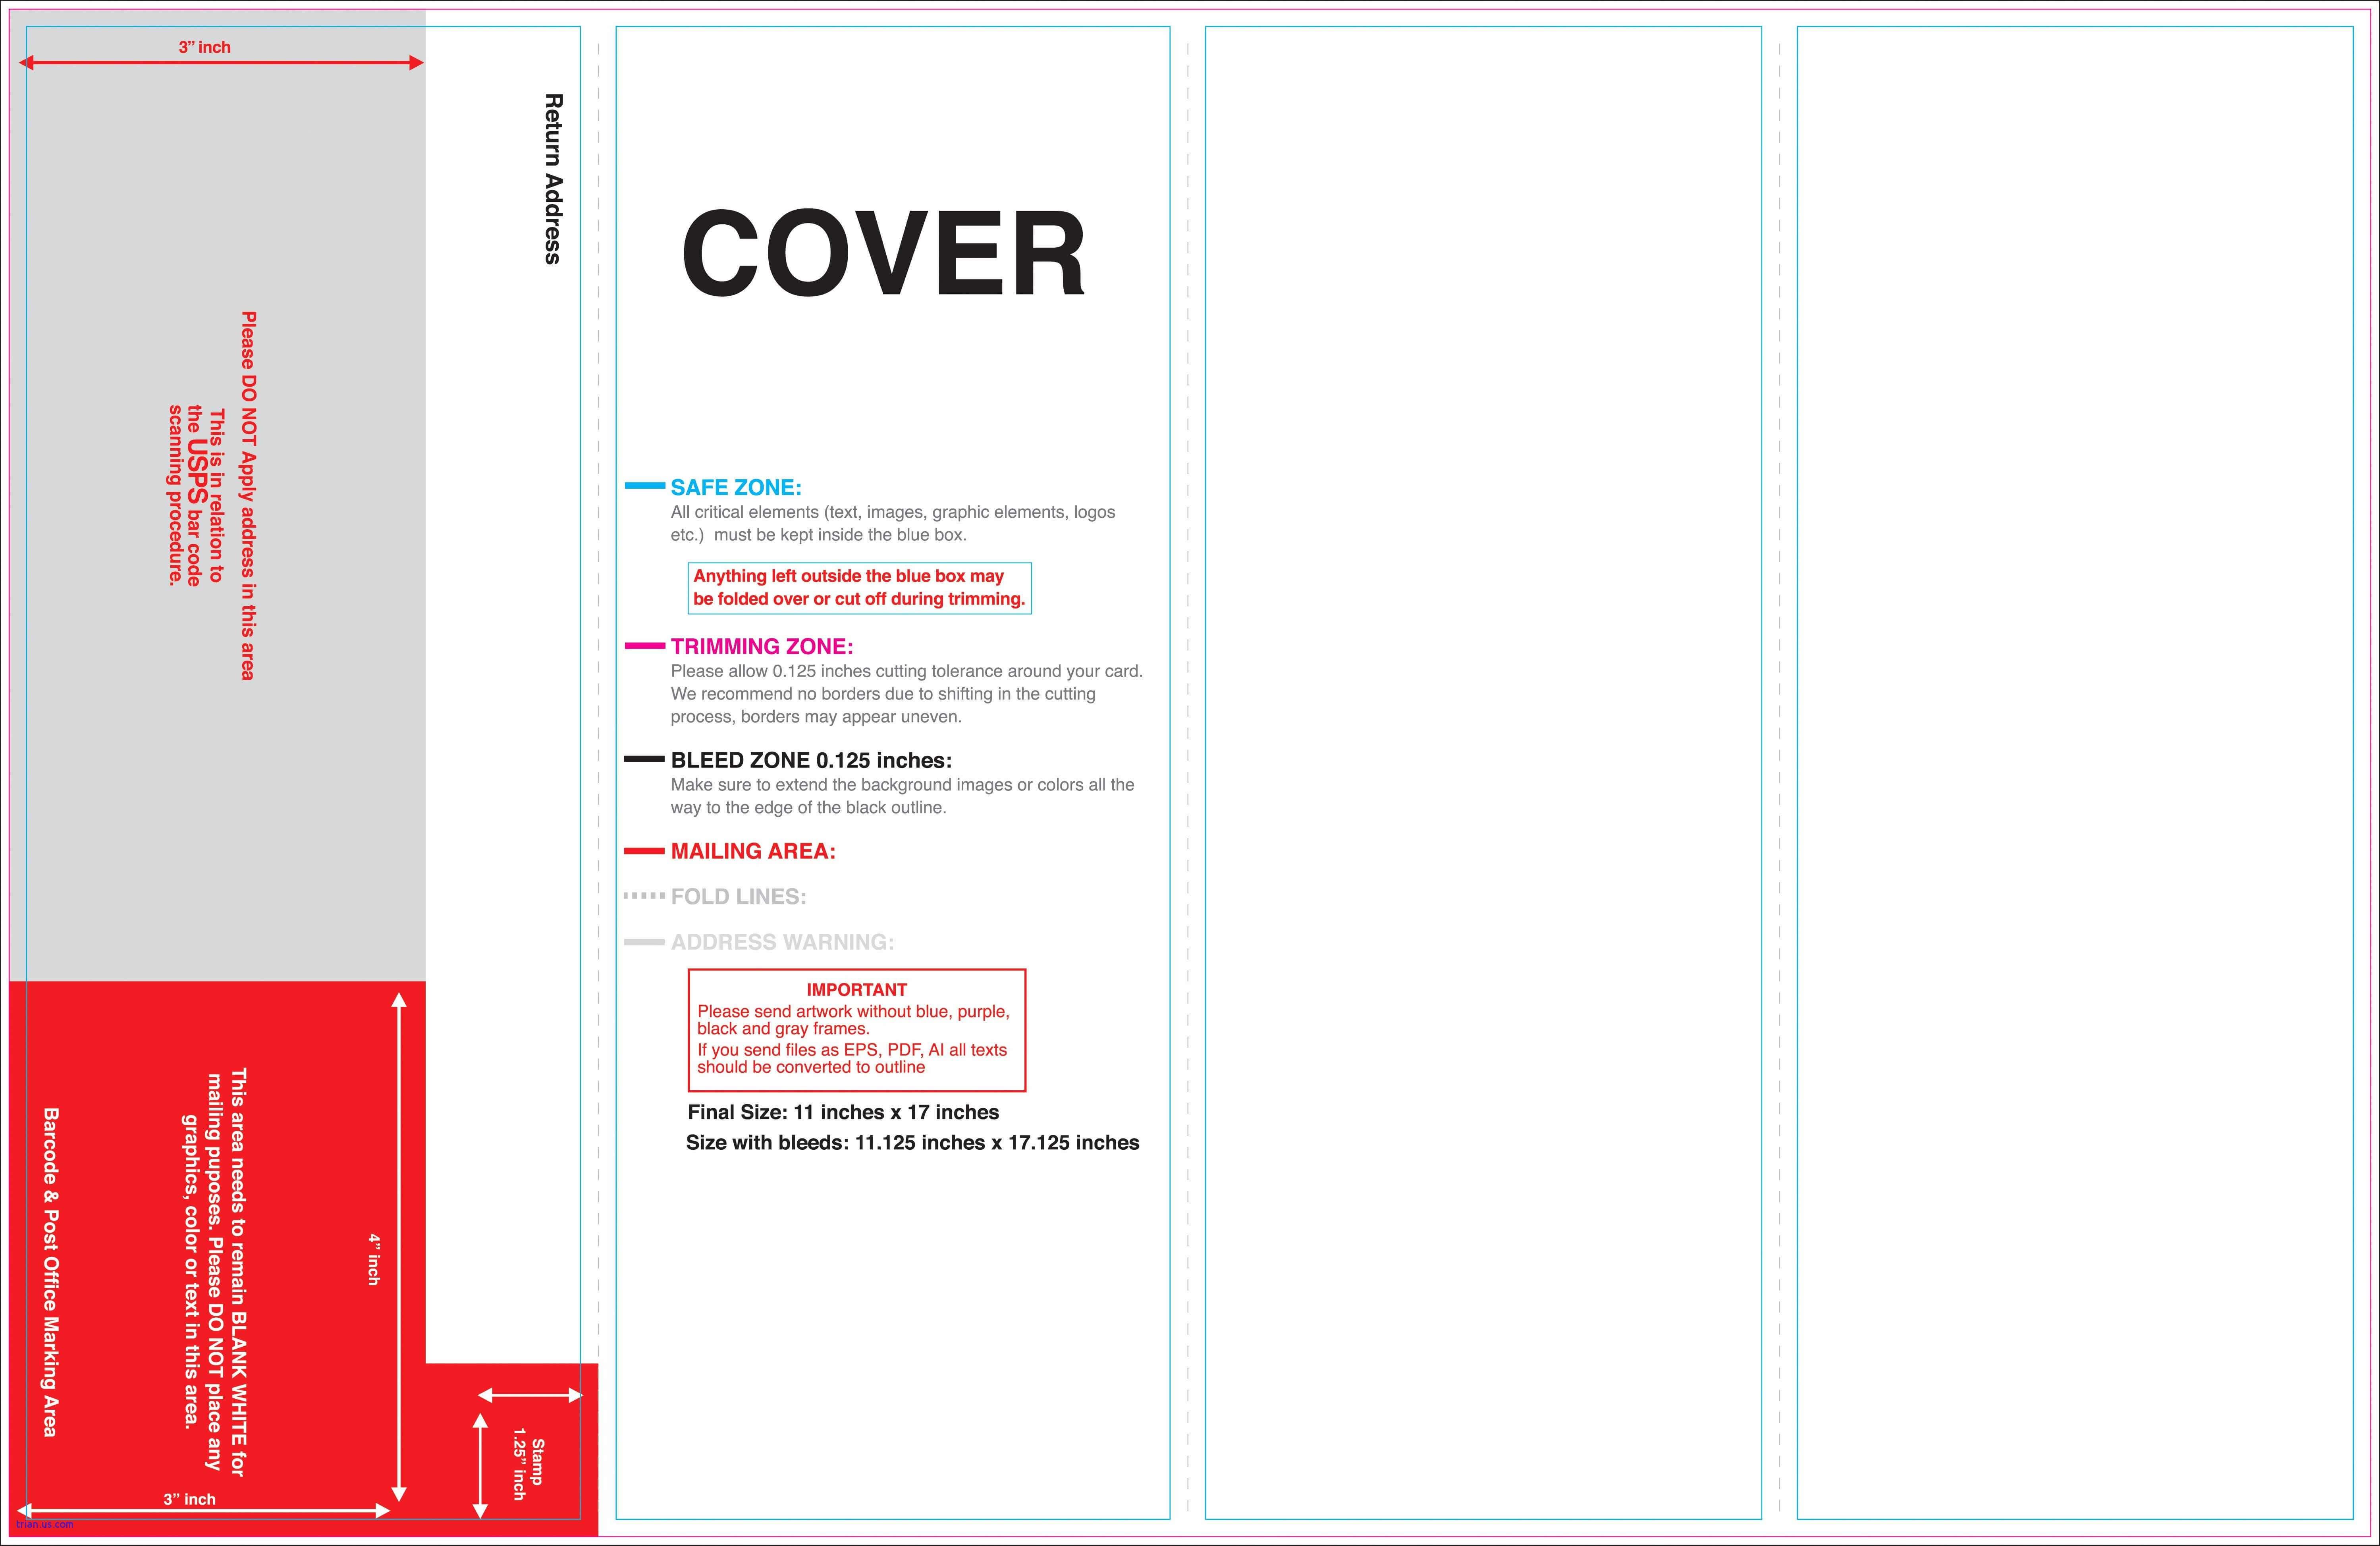 11×17 Half Fold Brochure Template Jparryhill - Carlynstudio regarding Quad Fold Brochure Template